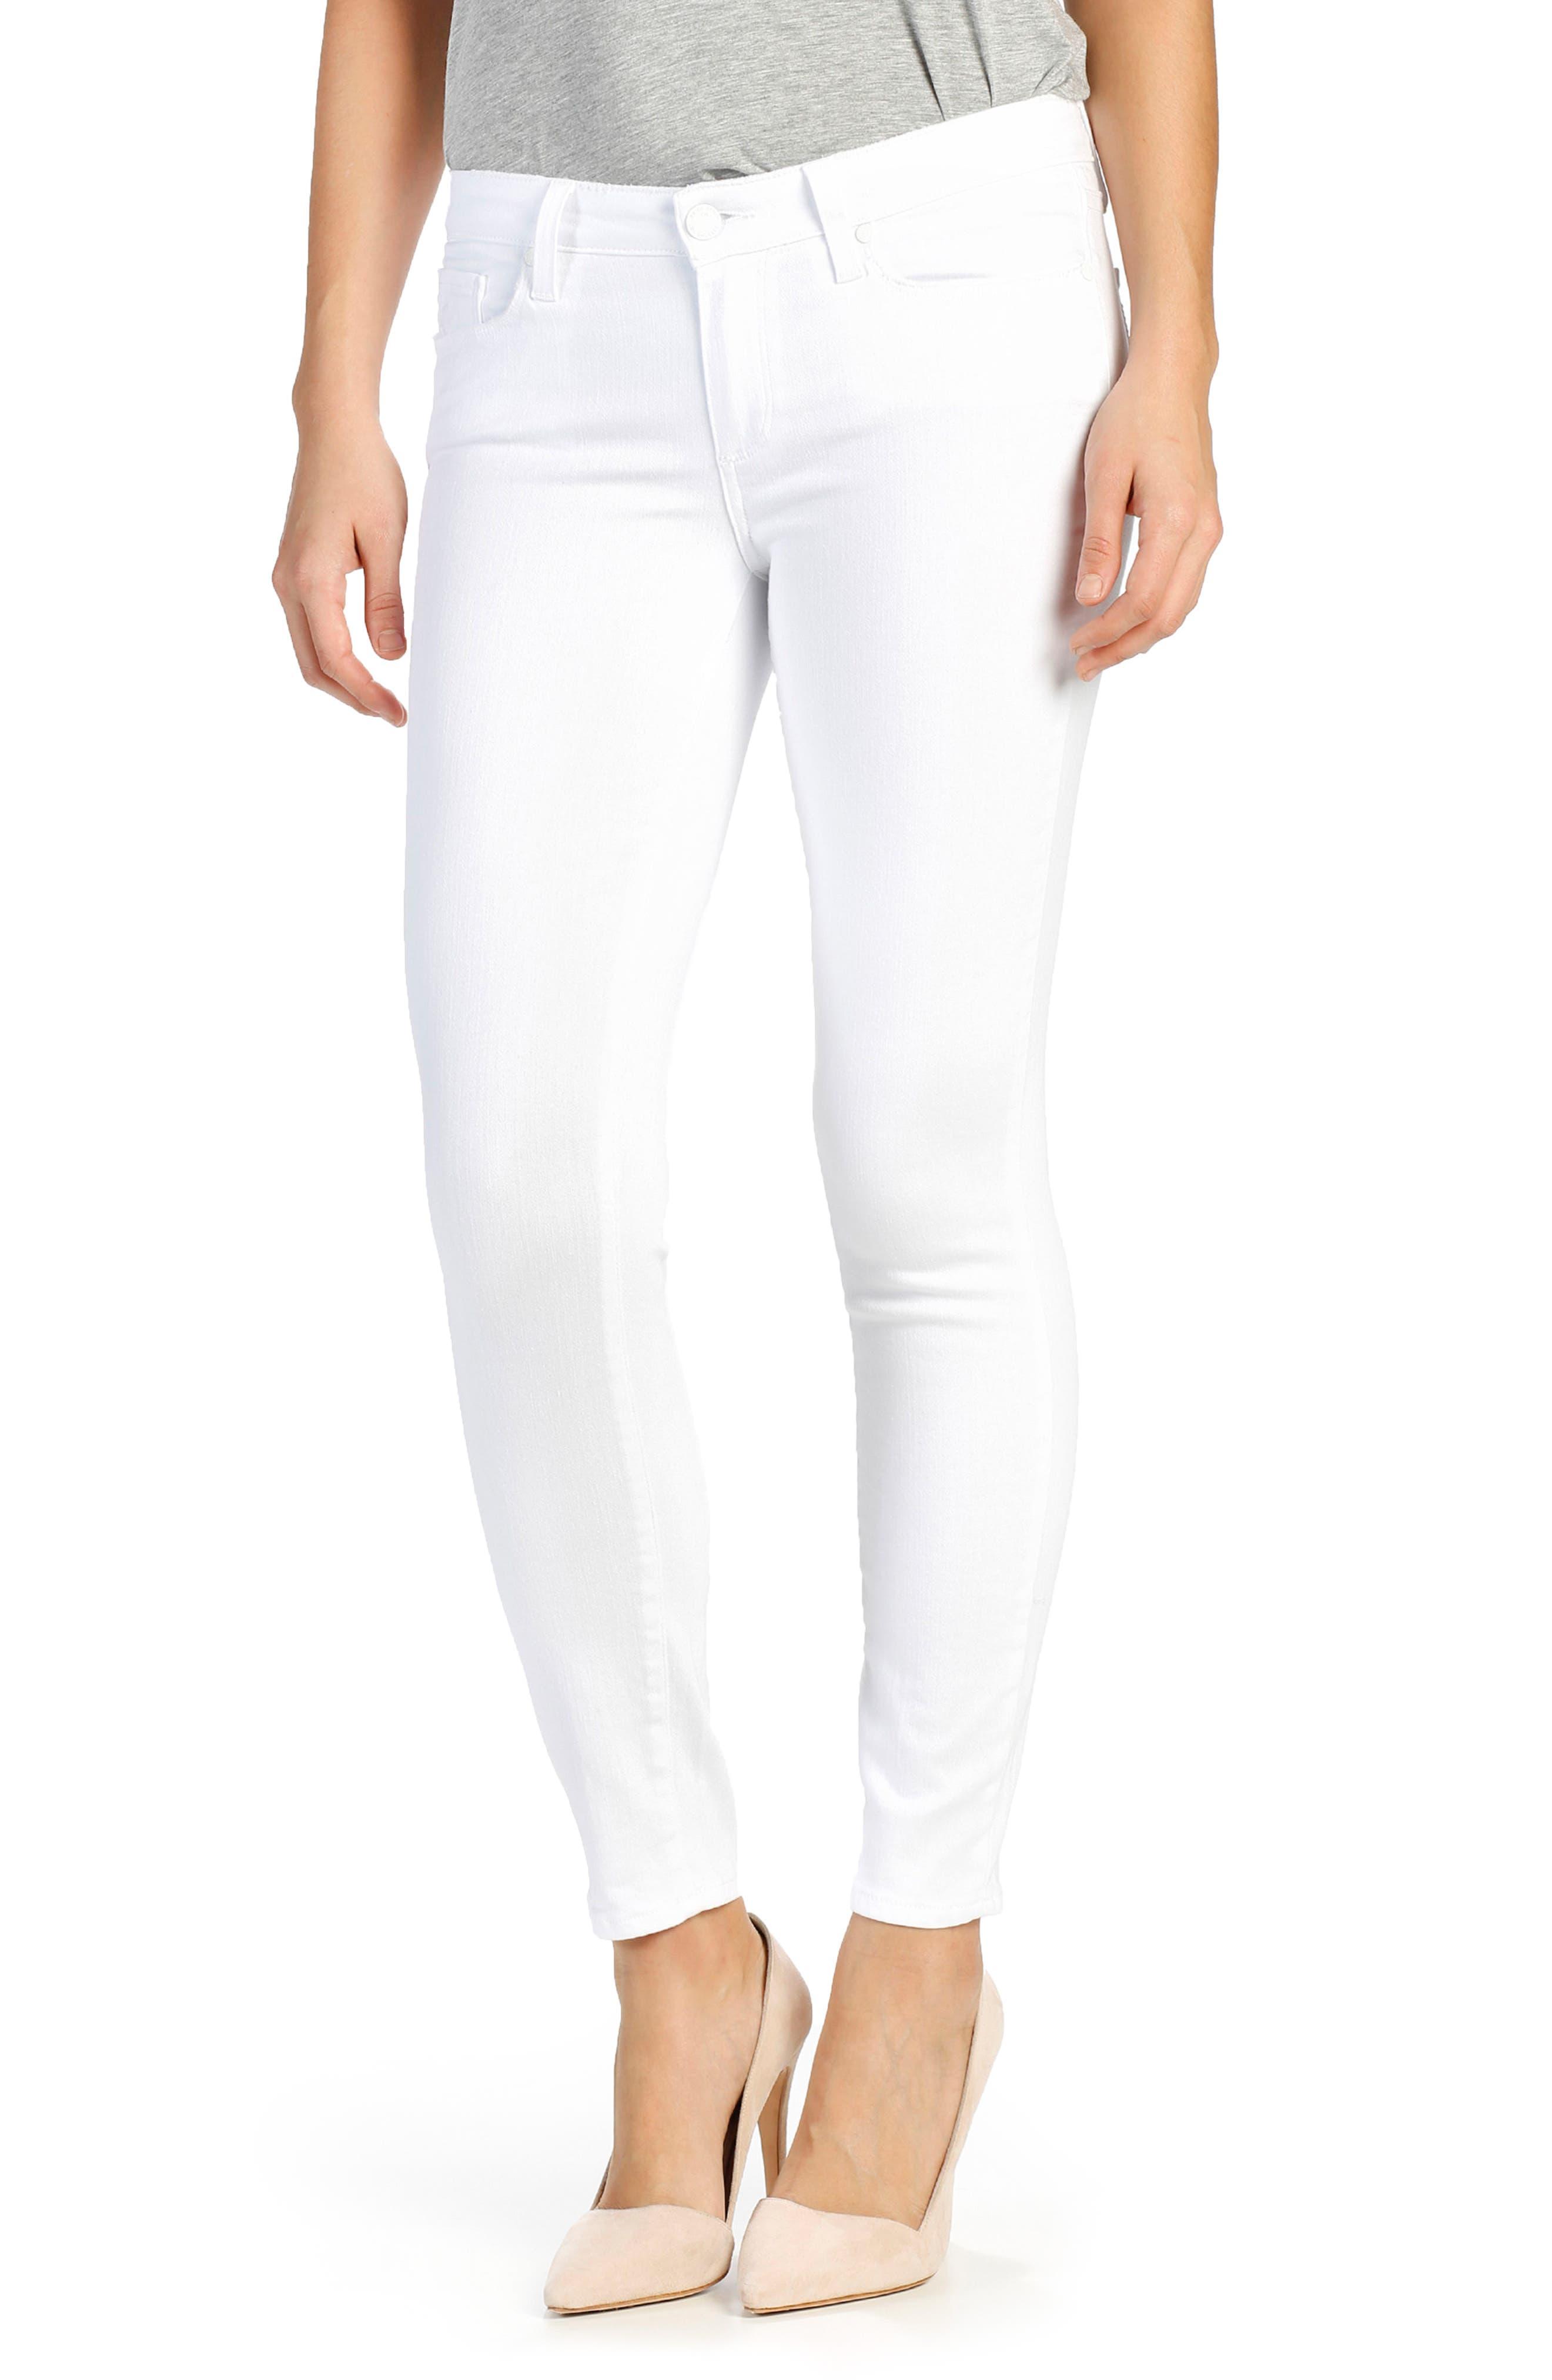 PAIGE, Verdugo Ankle Skinny Jeans, Alternate thumbnail 2, color, 100